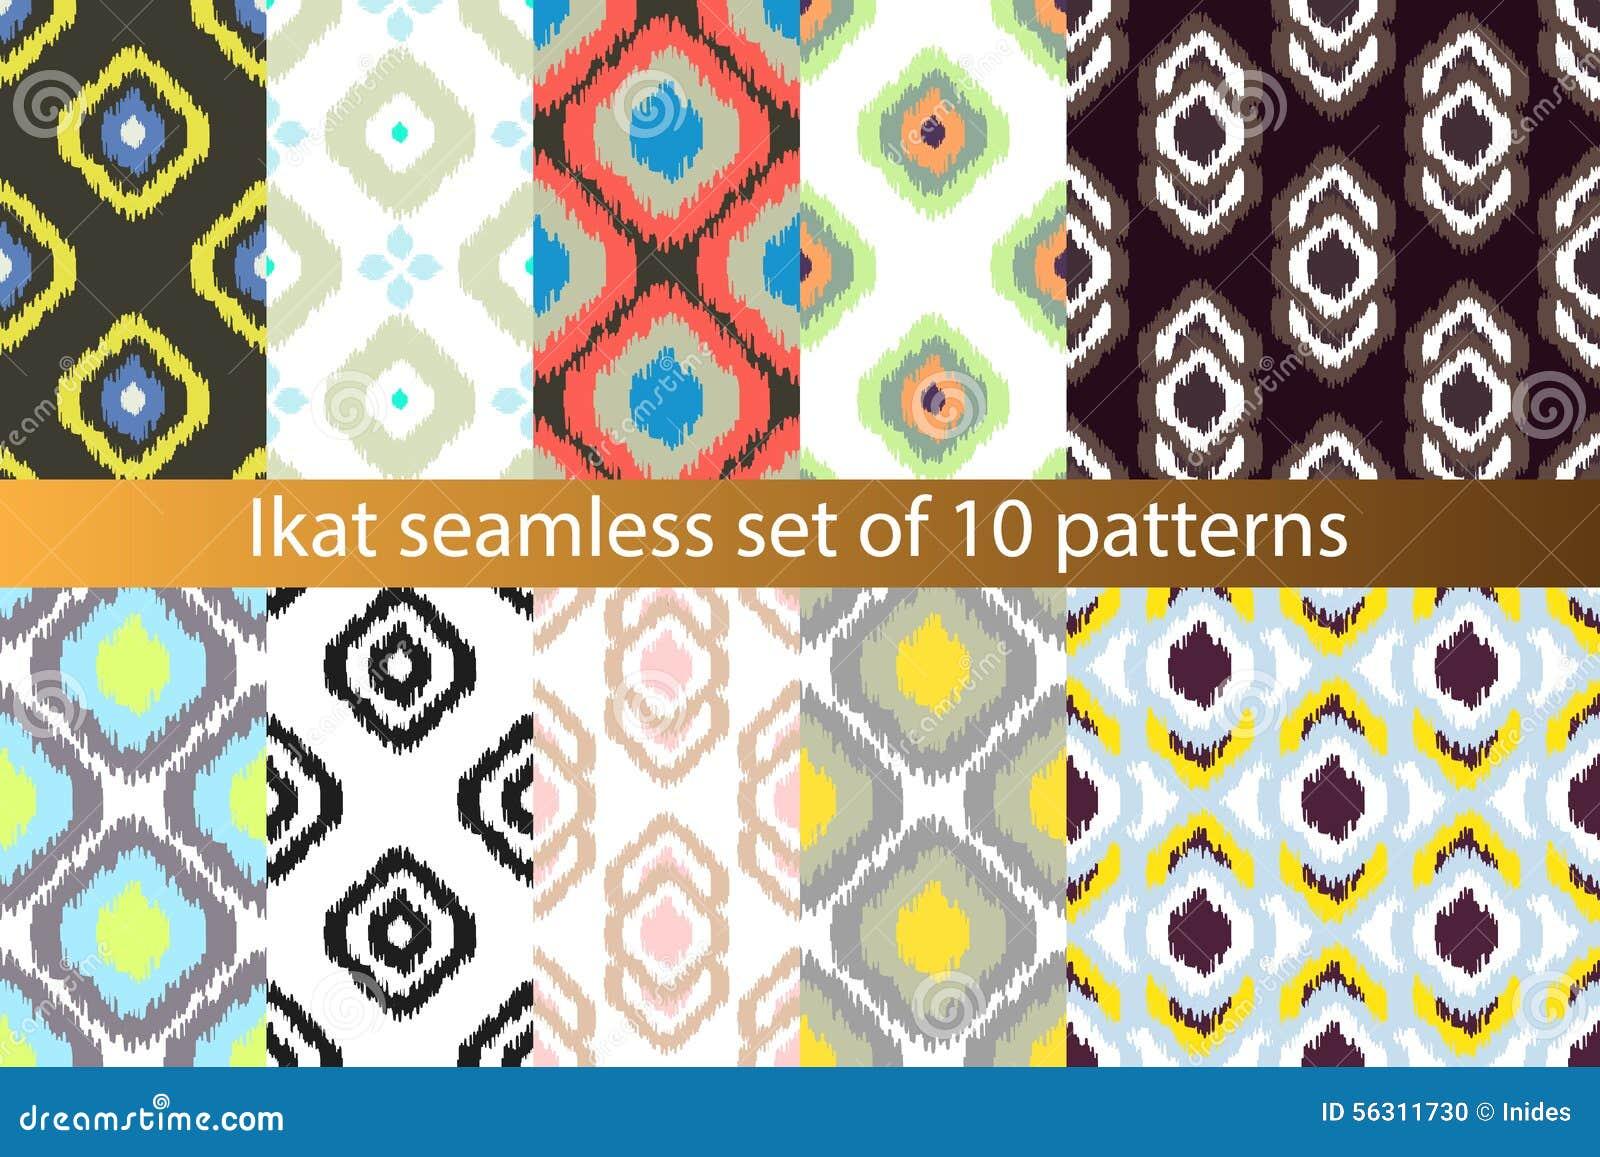 ikat wallpaper related keywords - photo #39